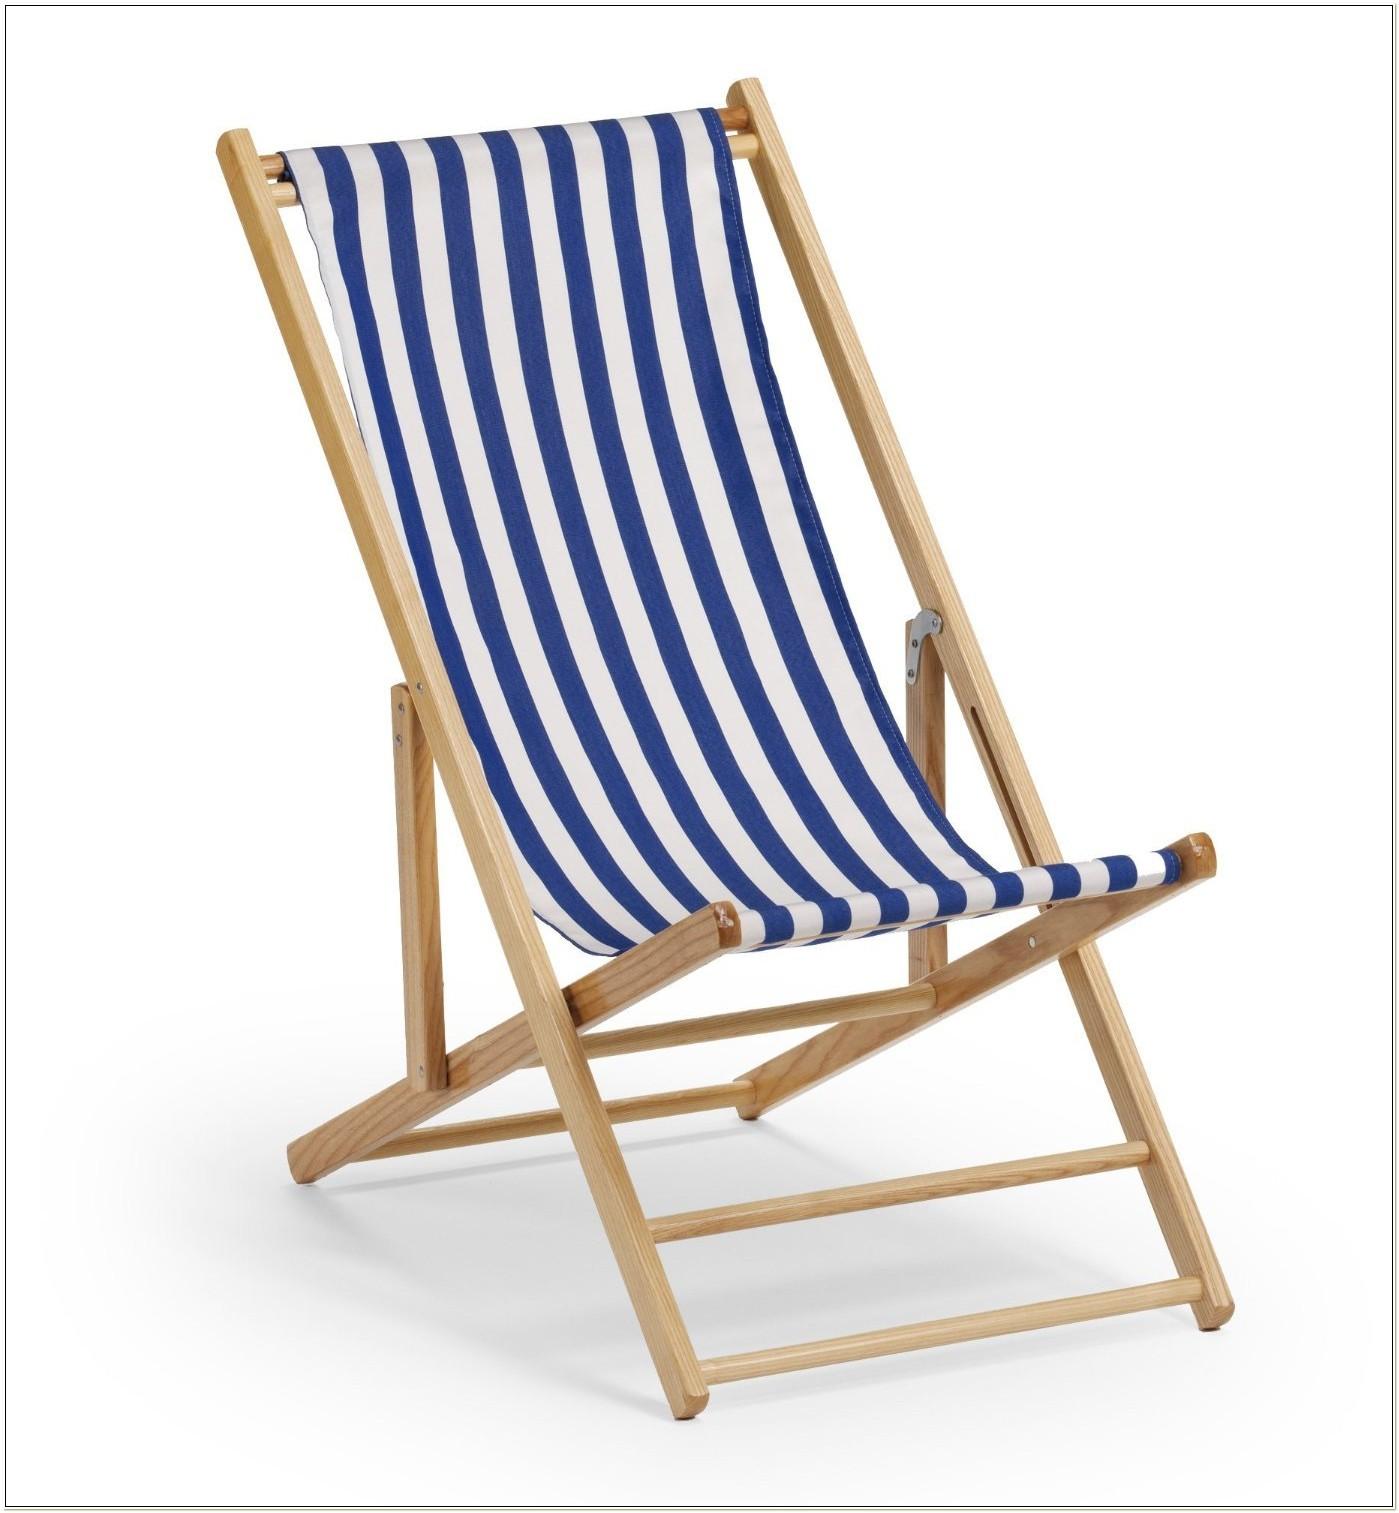 Telescope Casual Cabana Beach Folding Chair